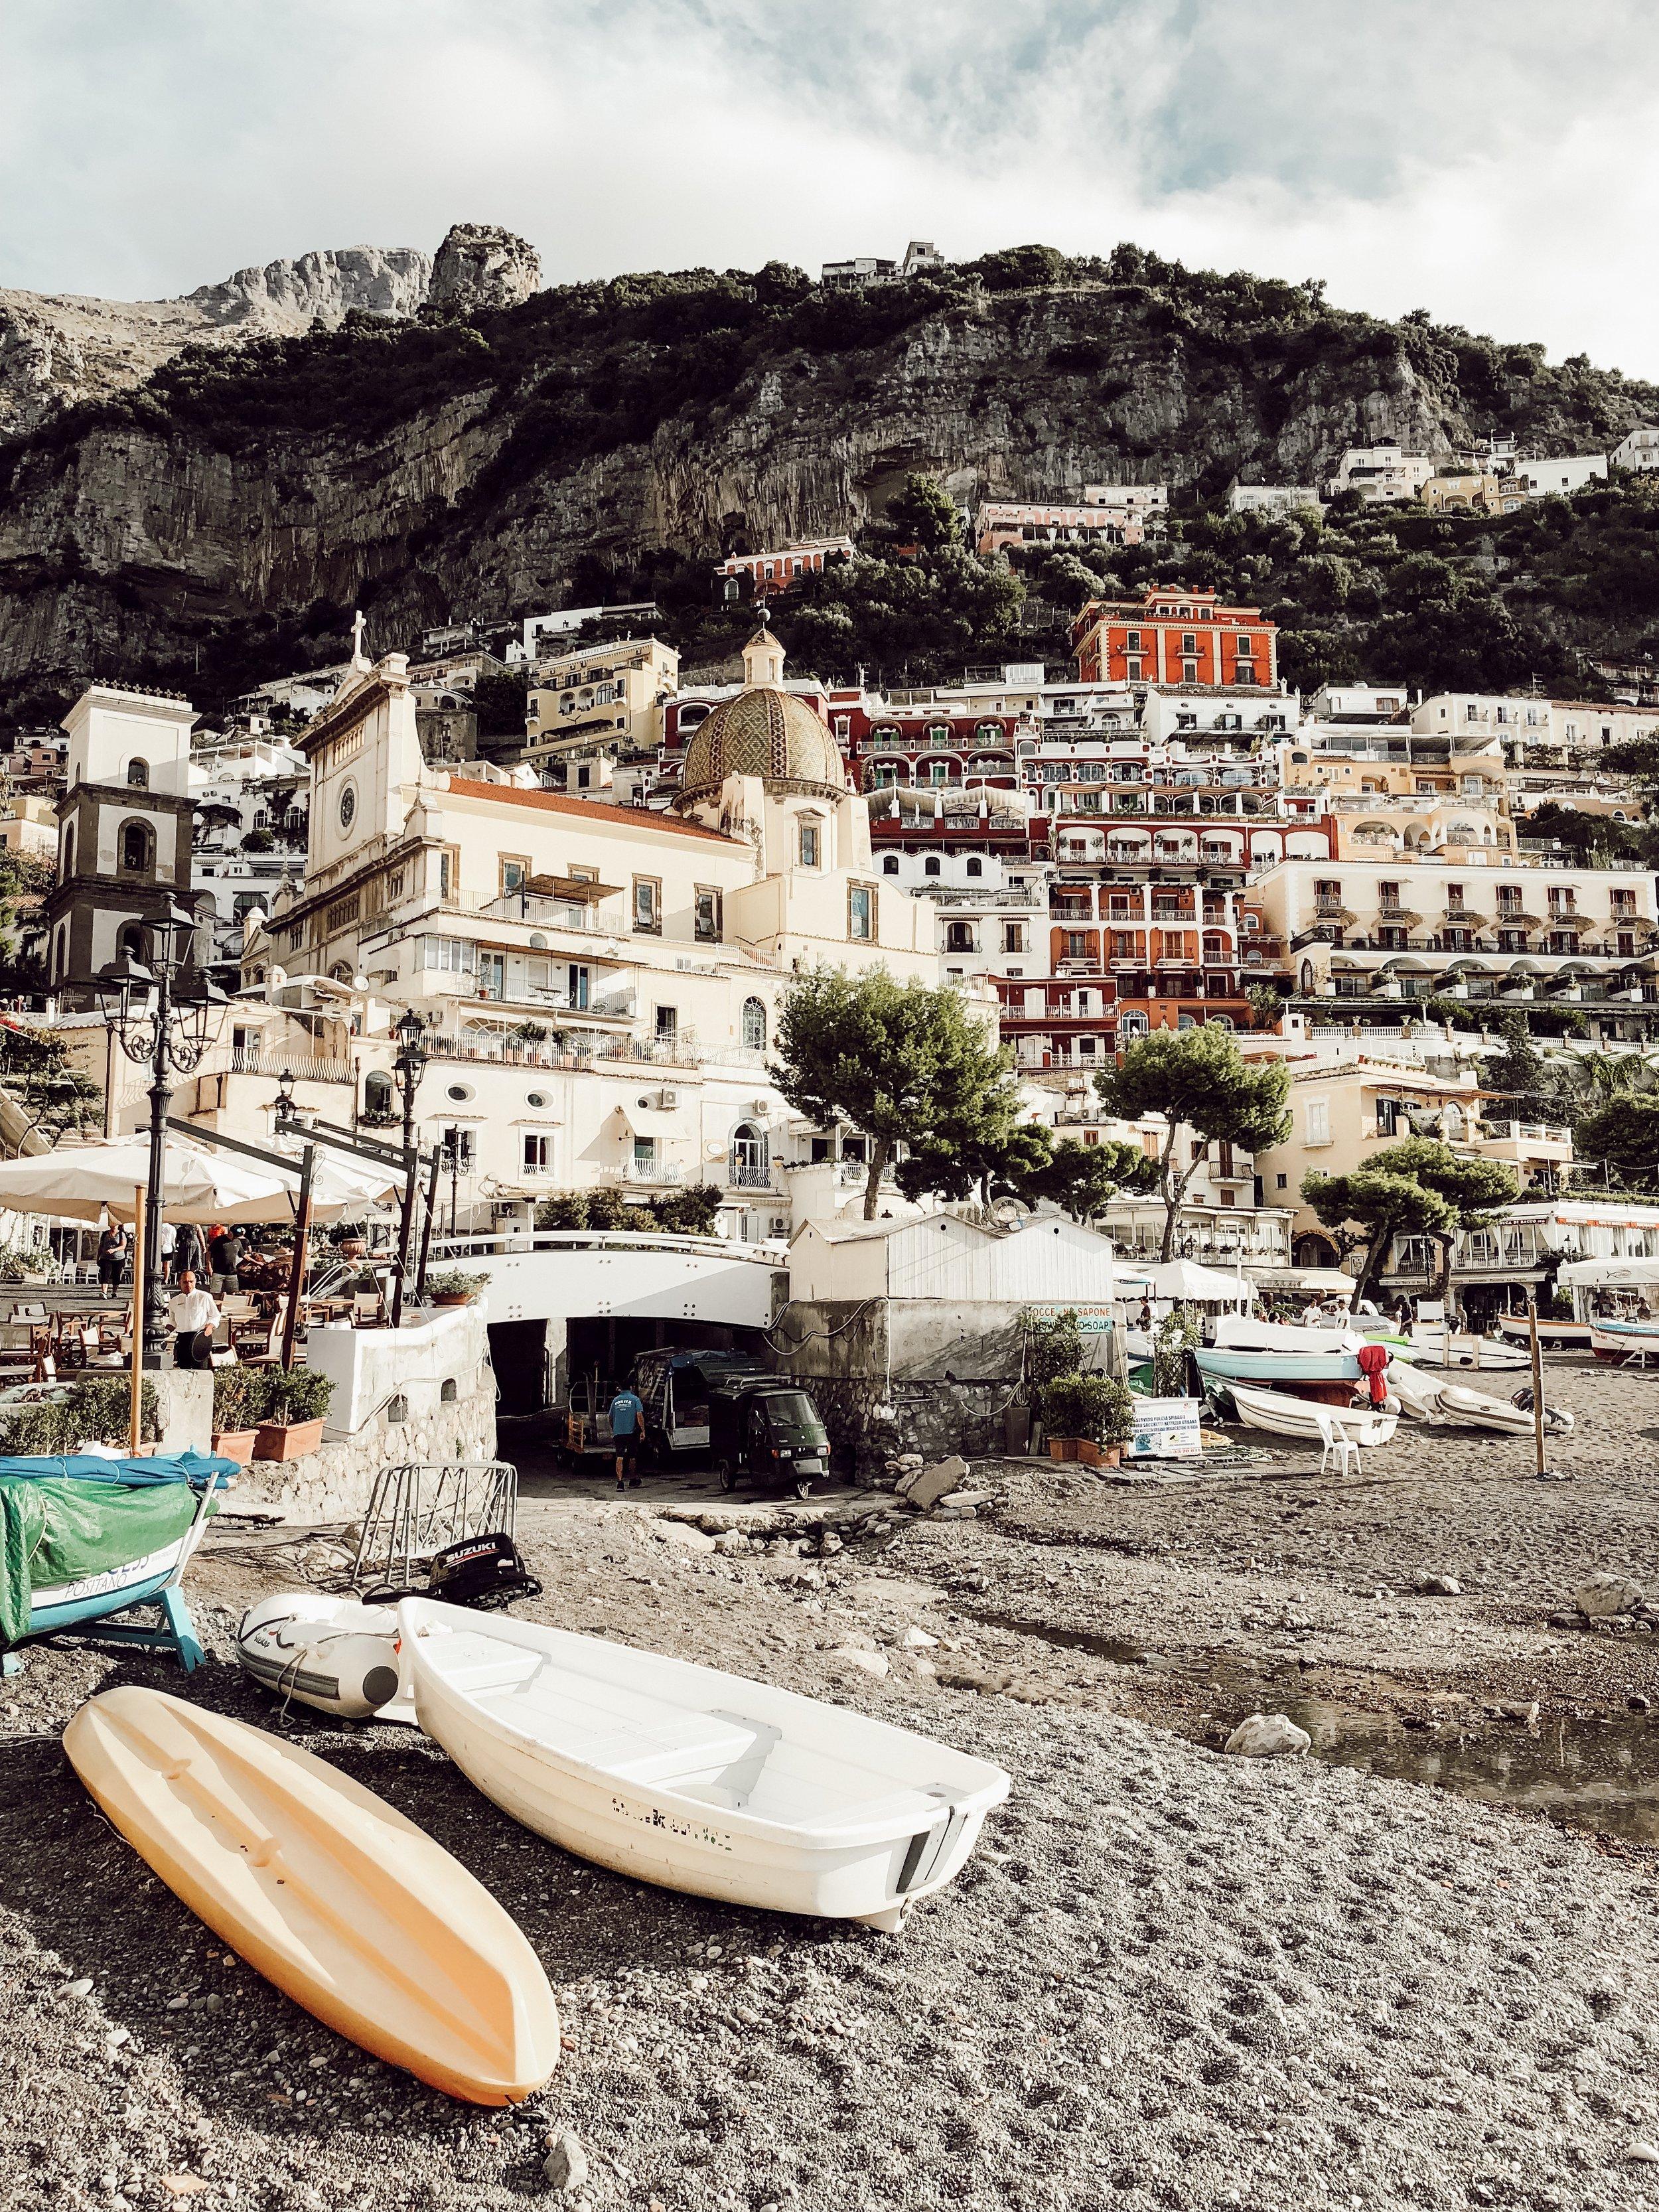 Beach in Positano Italy Amalfi Coast | Three Days on the Amalfi Coast, Amalfi Travel Guide, What to Do in Amalfi Italy | Miranda Schroeder Blog